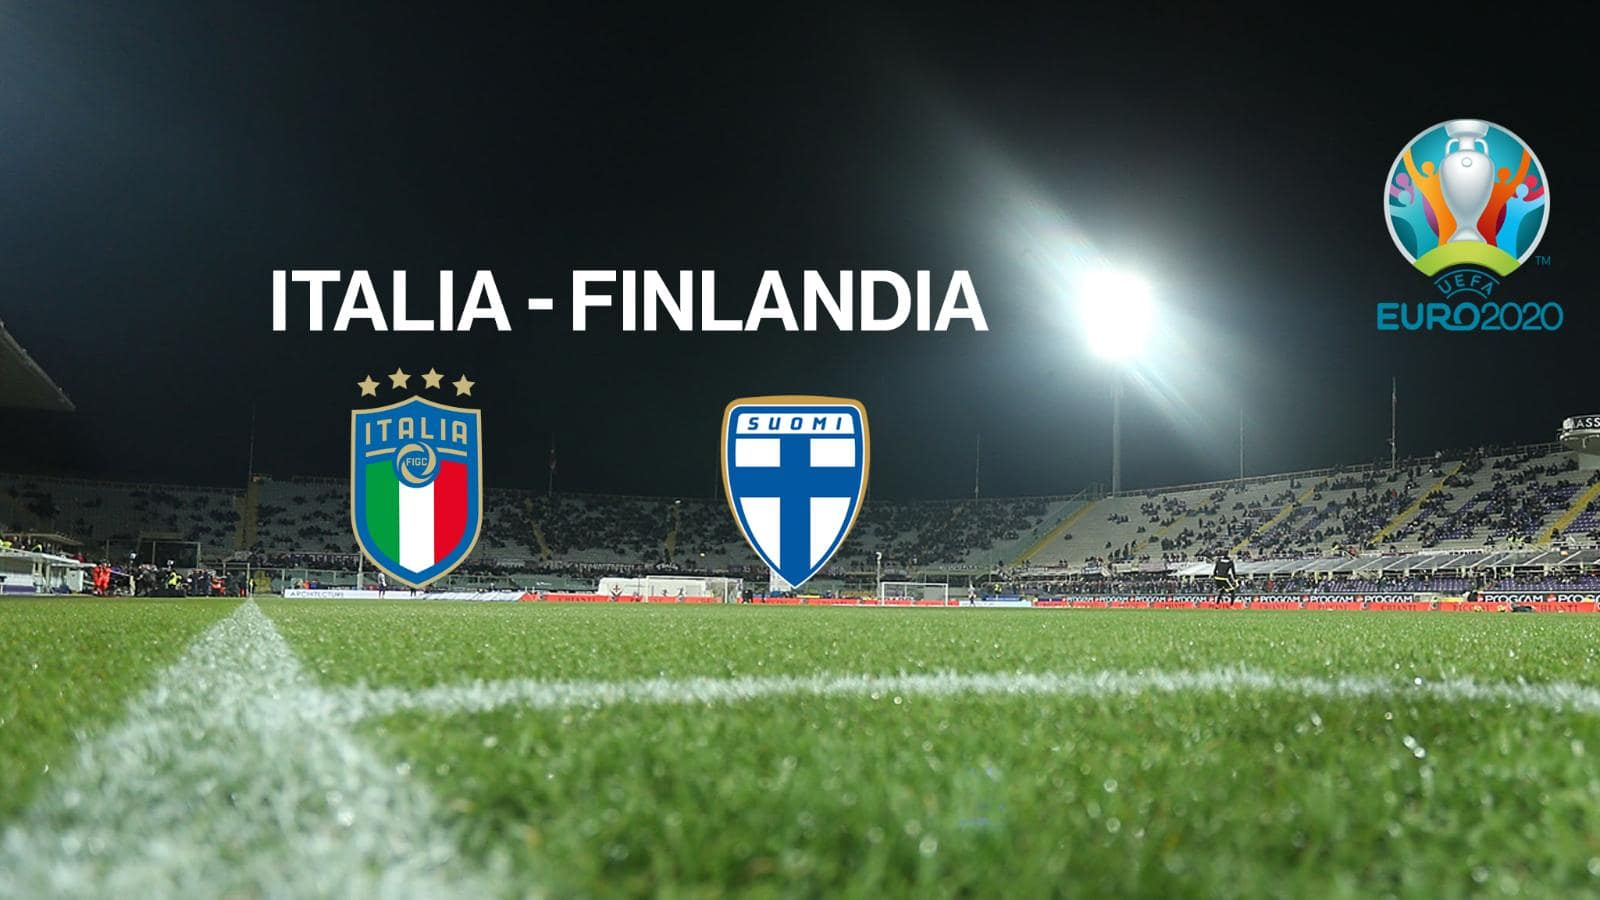 Stasera in tv Italia - Finlandia